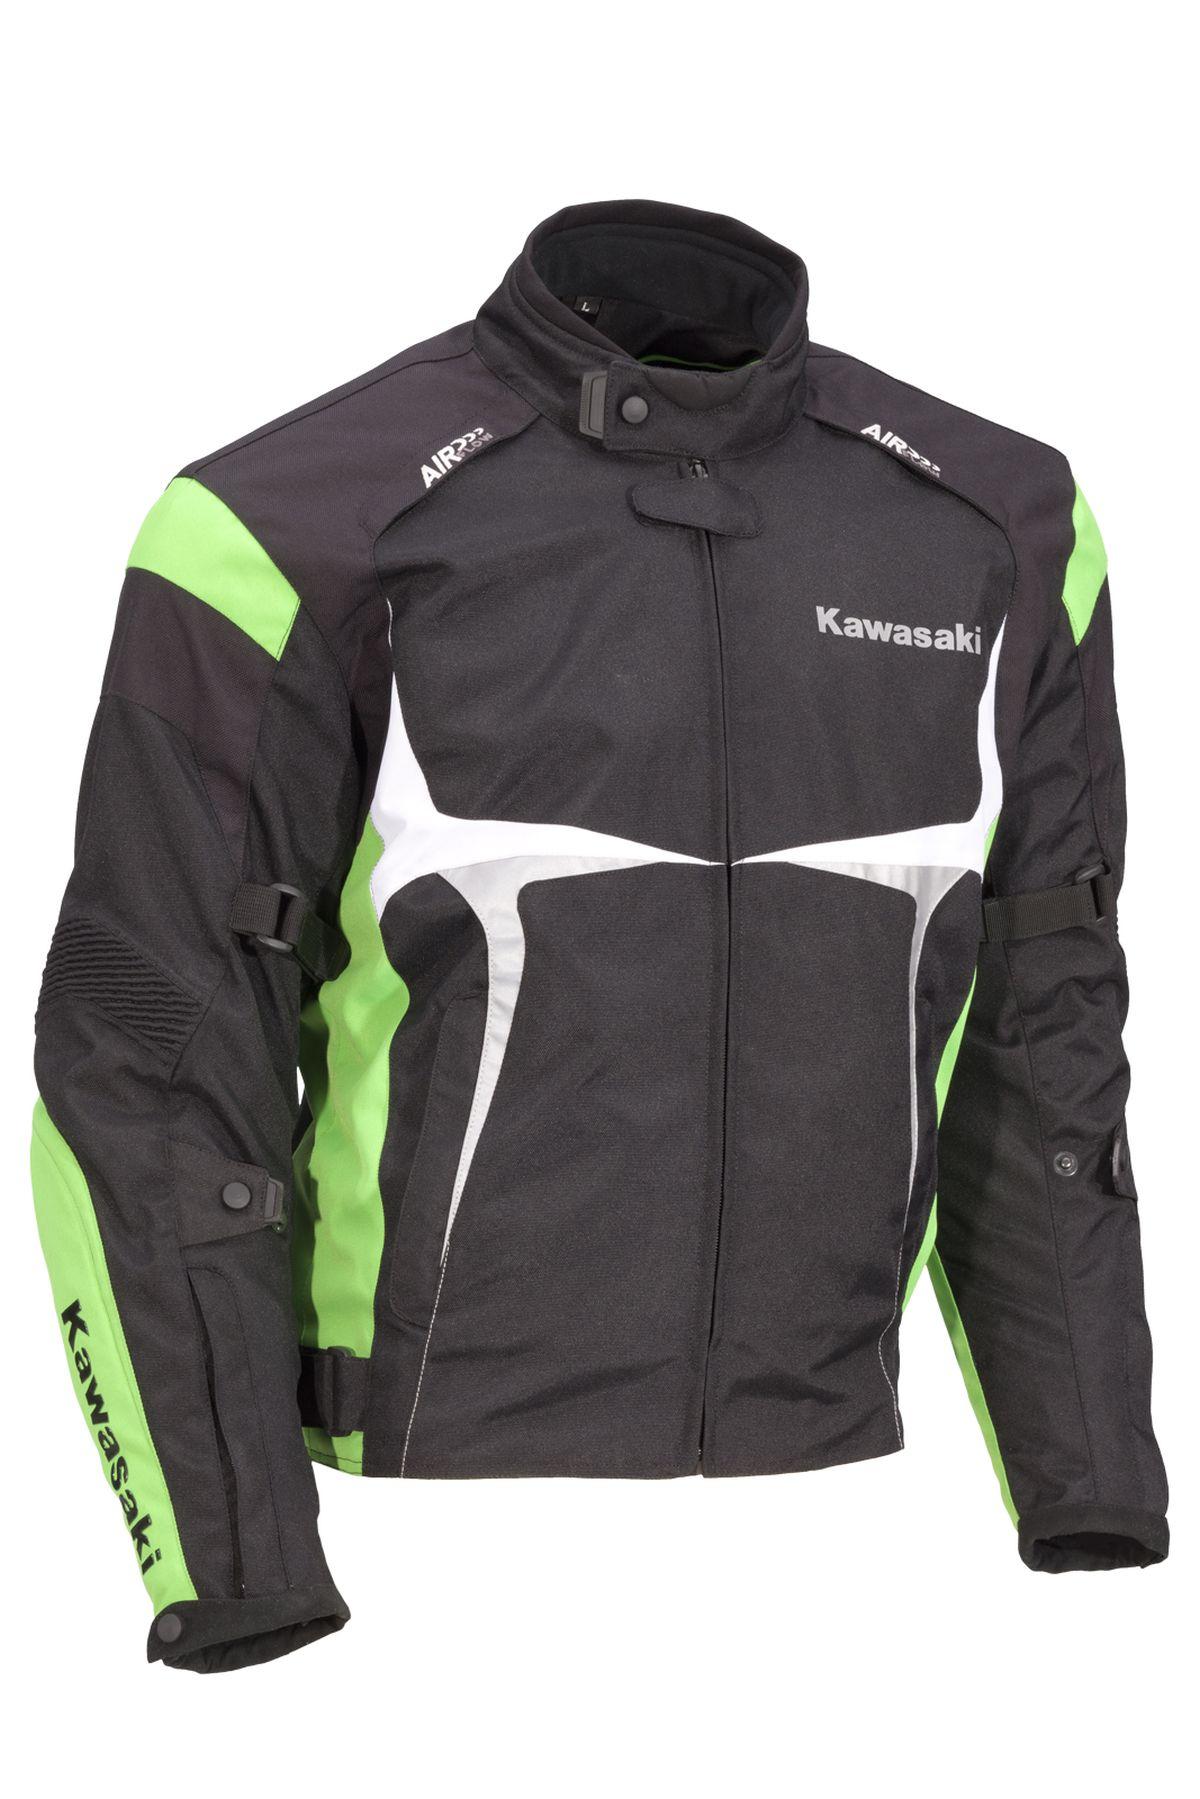 Kawasaki Road Racing Jacket